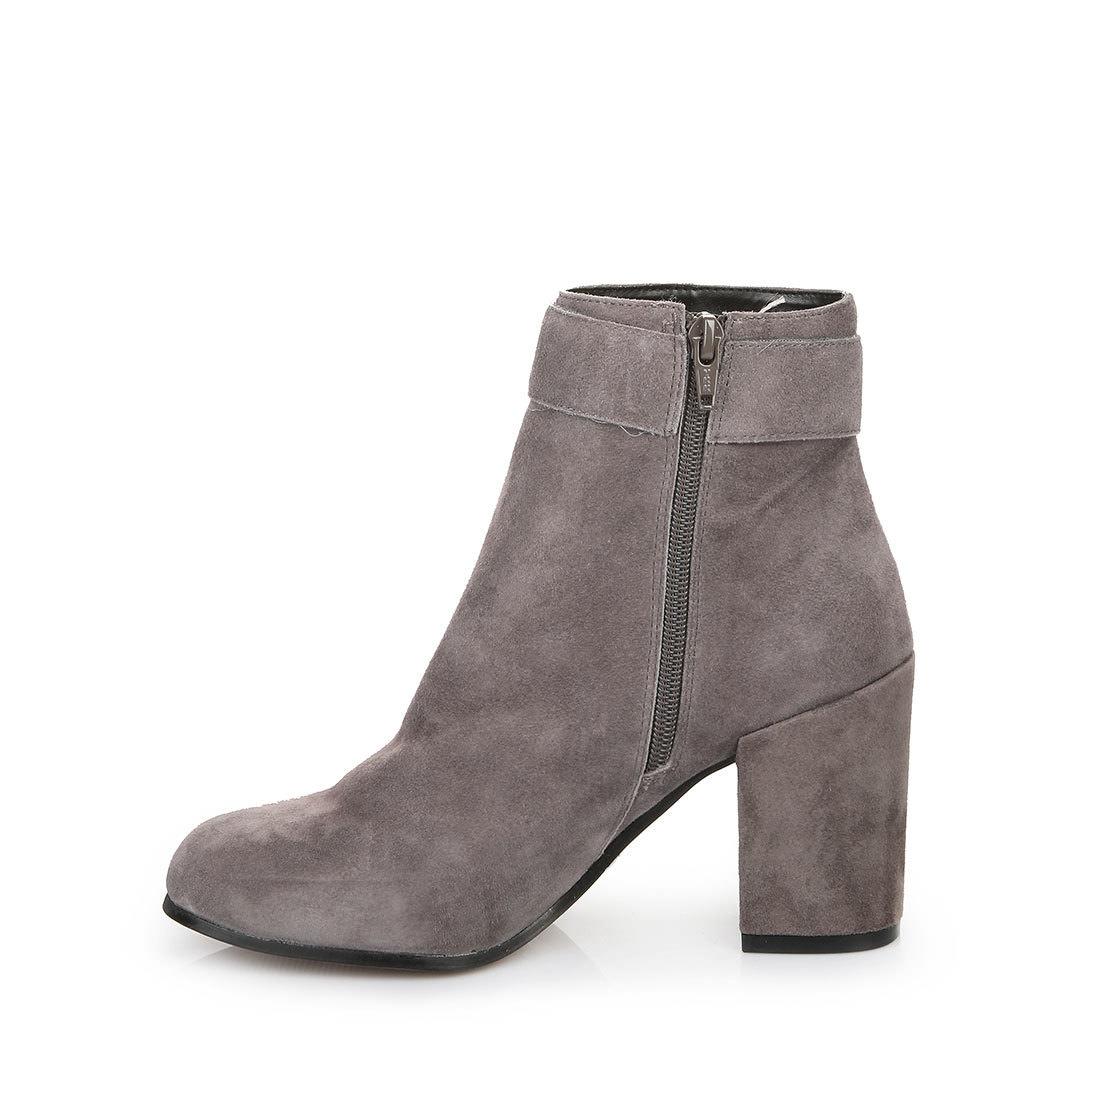 buffalo ankle boots in grey buy online in buffalo online shop buffalo. Black Bedroom Furniture Sets. Home Design Ideas